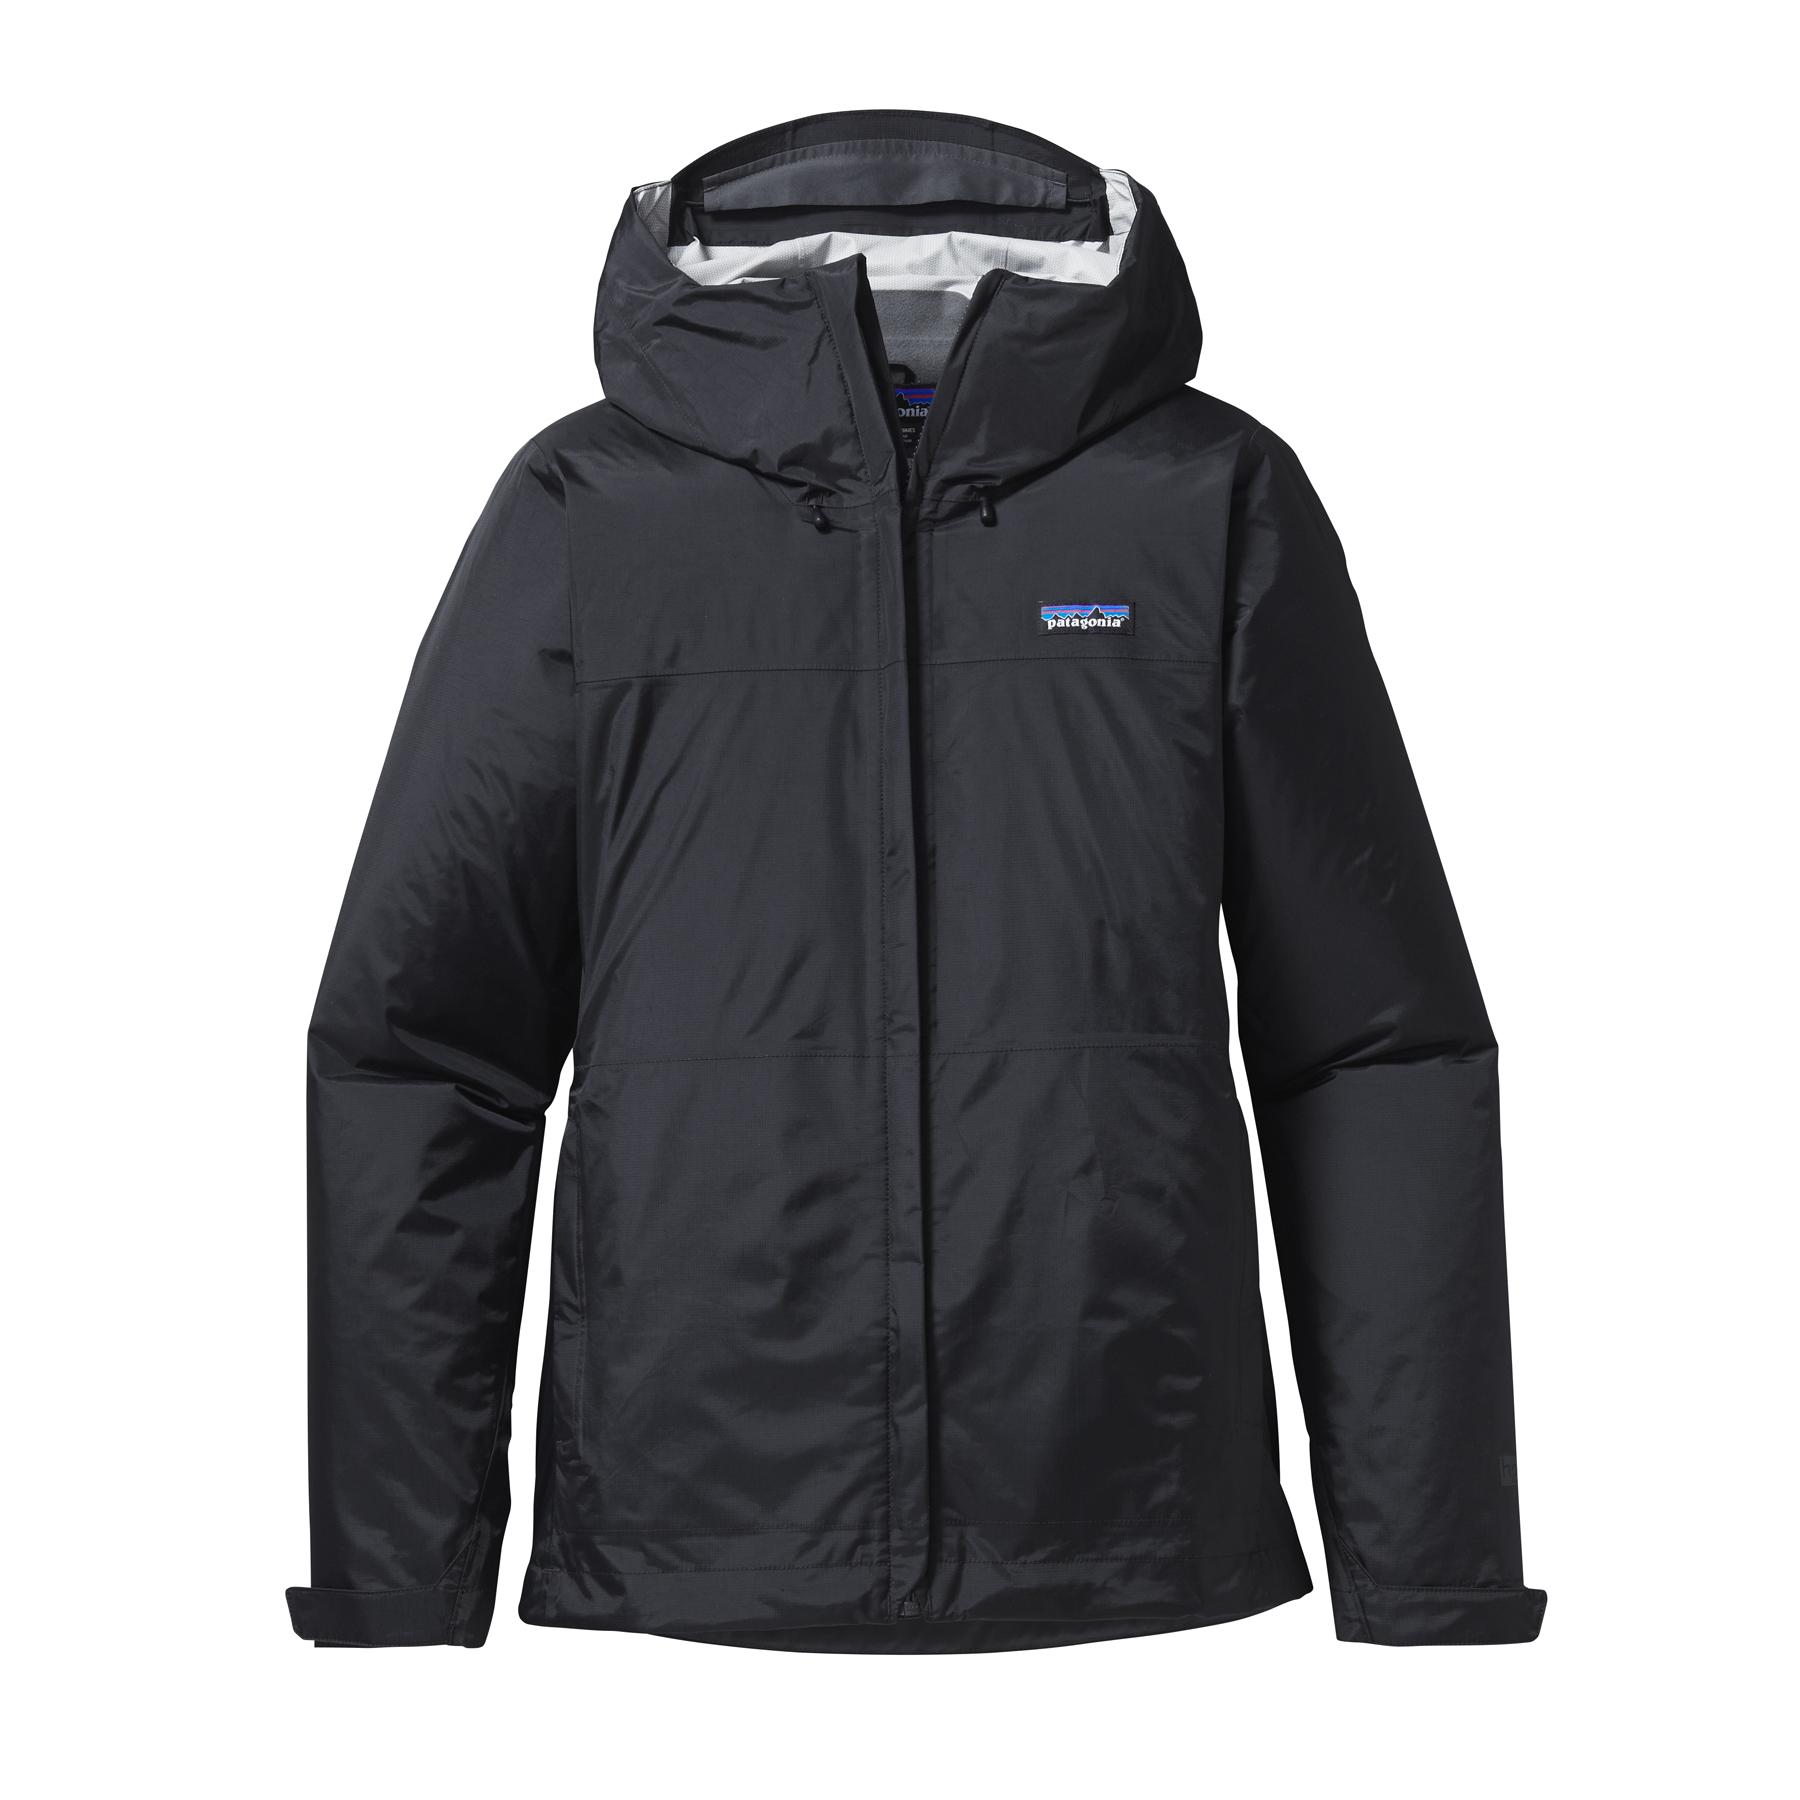 Patagonia - Torrentshell - Hardshell jacket - Women's